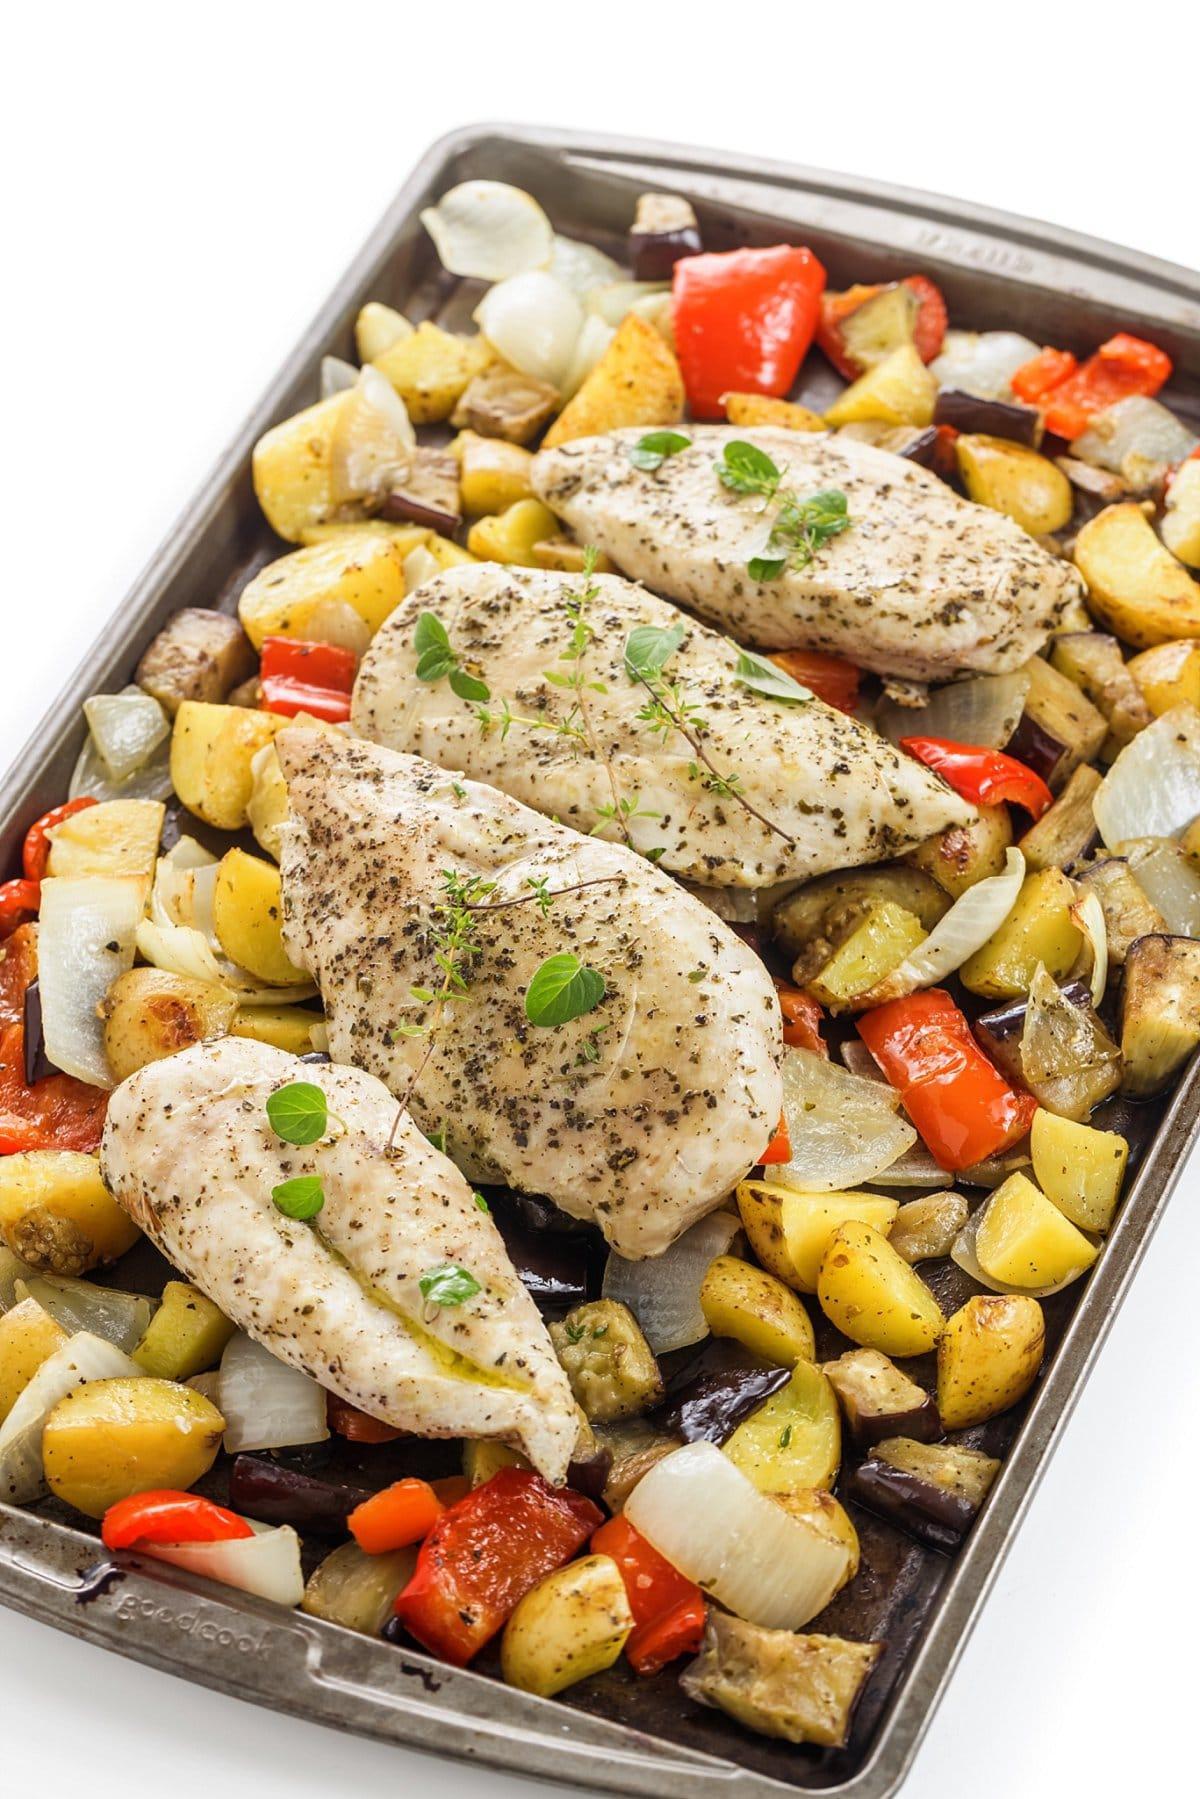 Sheet pan Greek chicken and vegetables.